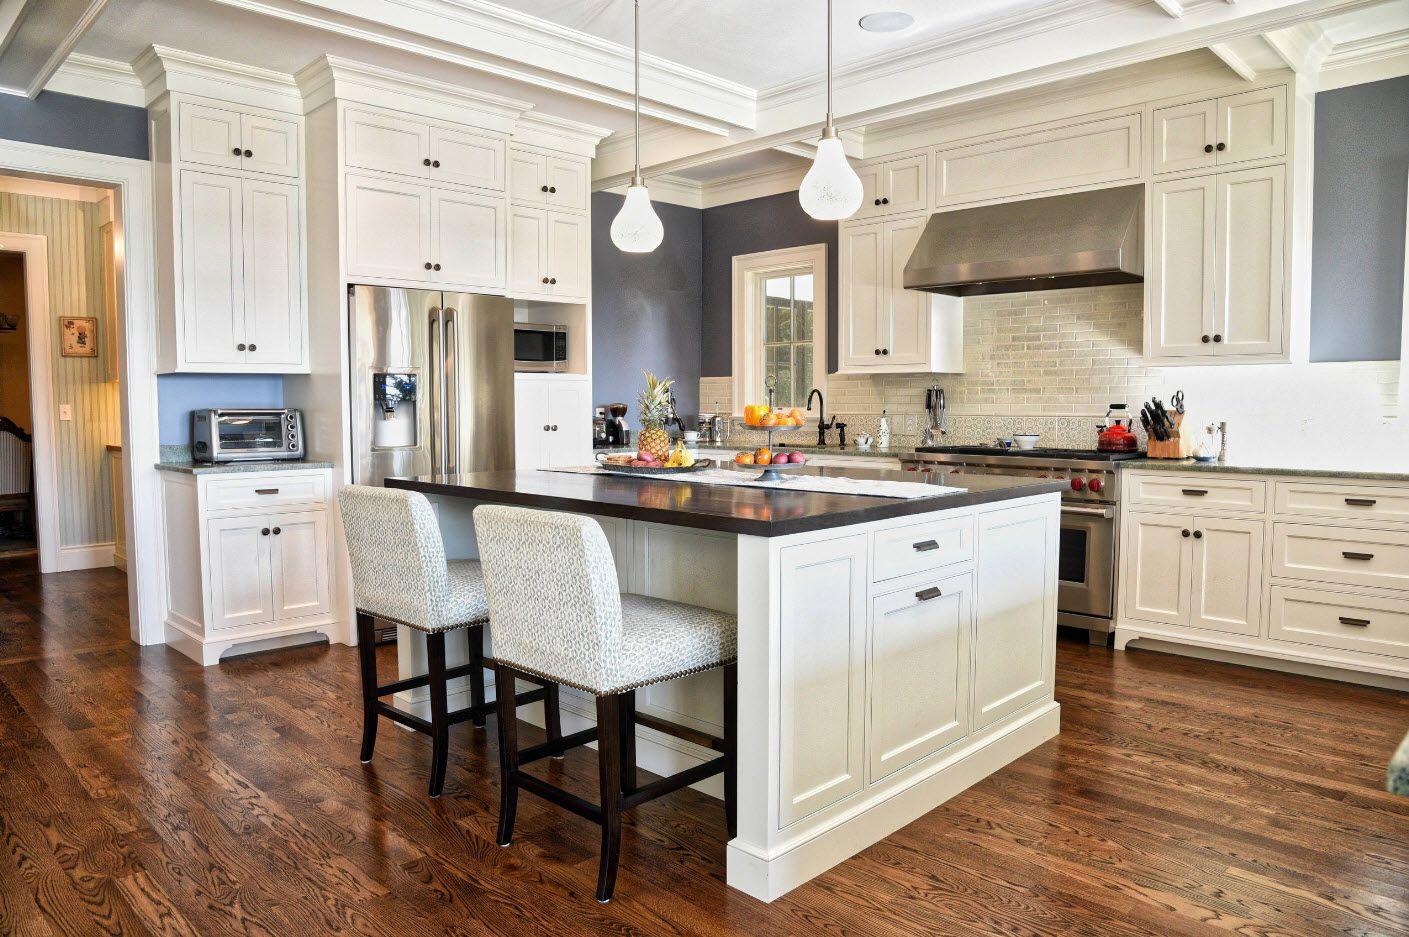 100+ Photo Design Ideas of Modern, Comfortable IKEA Kitchens - Small ...